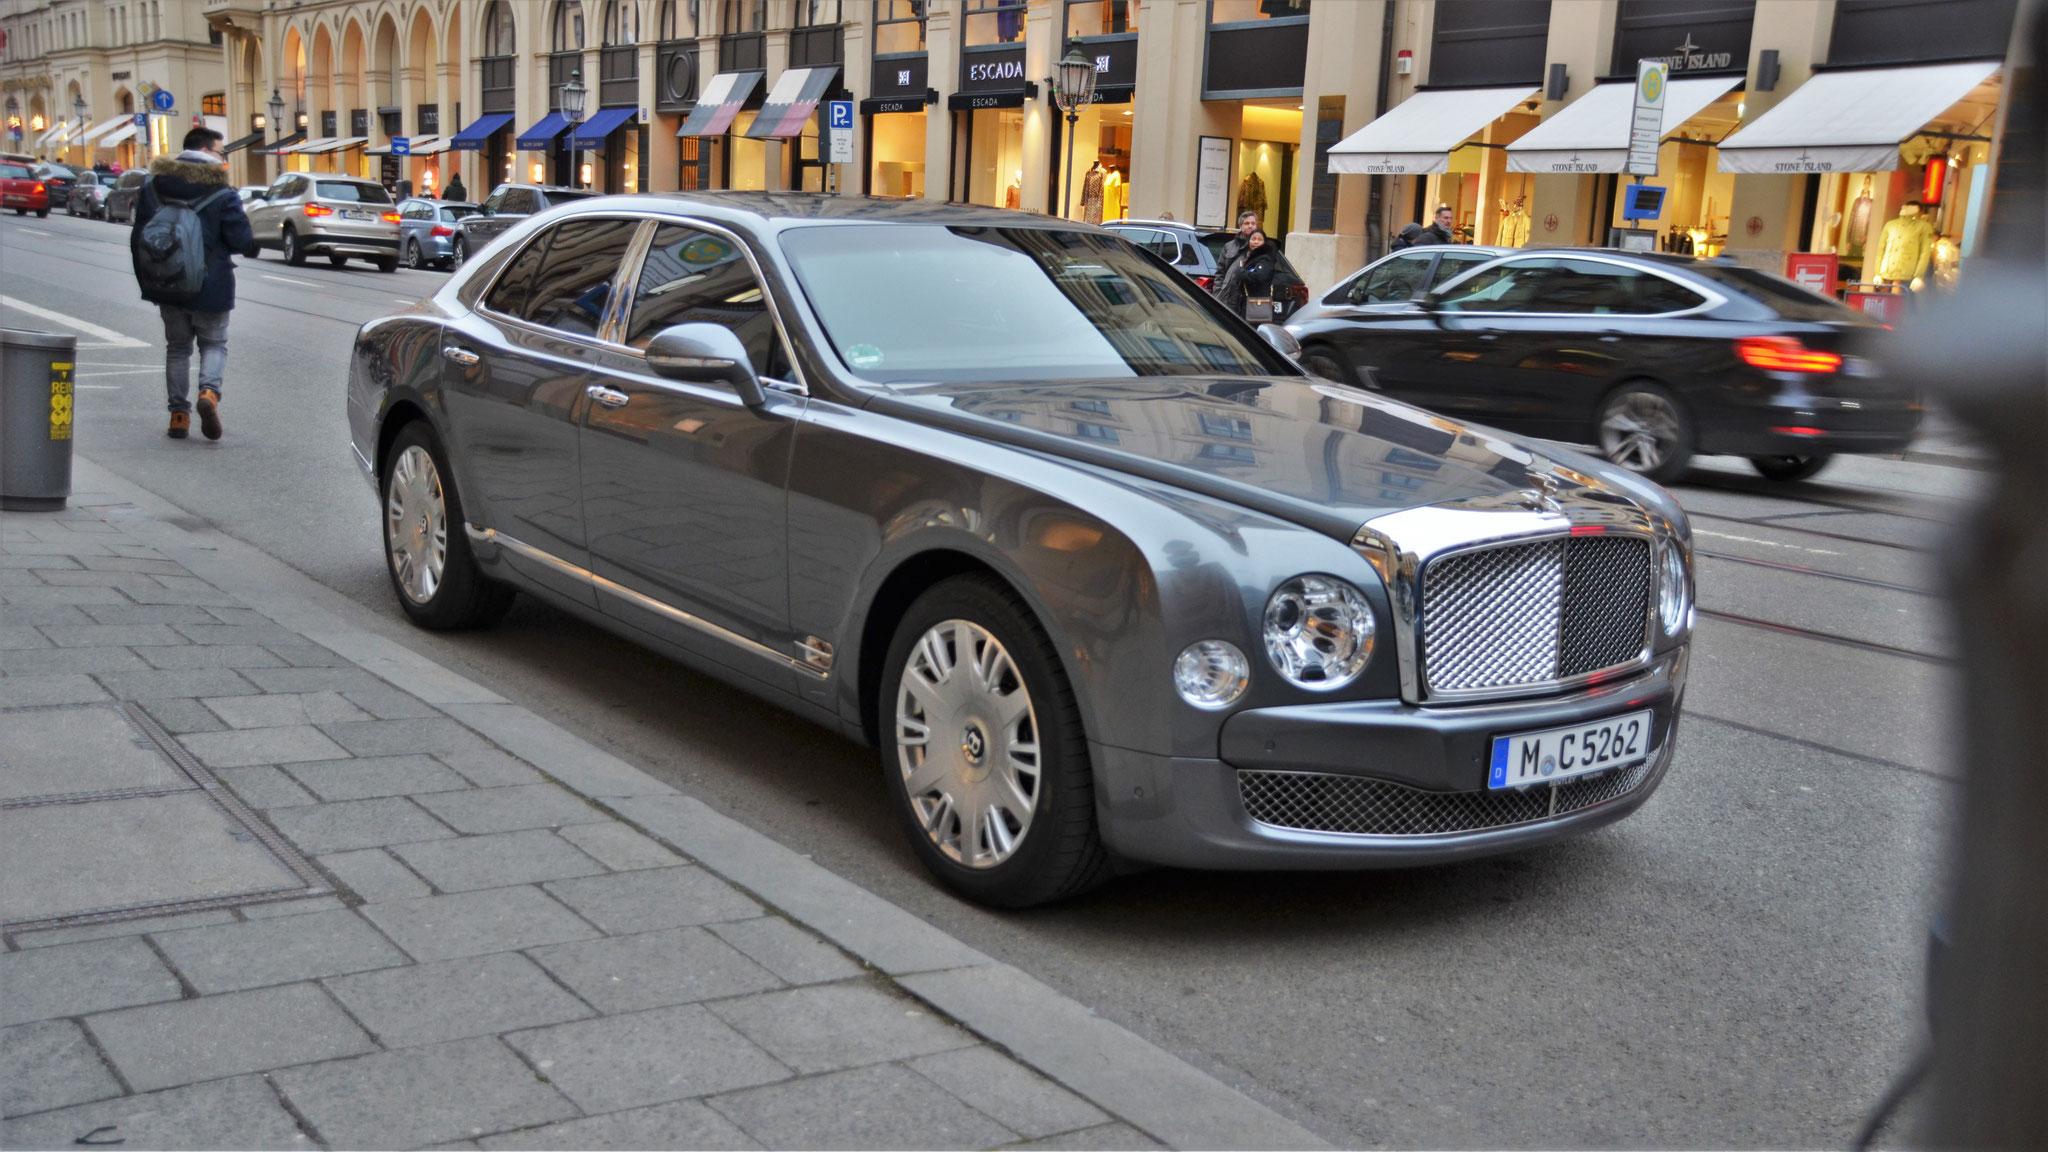 Bentley Mulsanne - M-C-5262